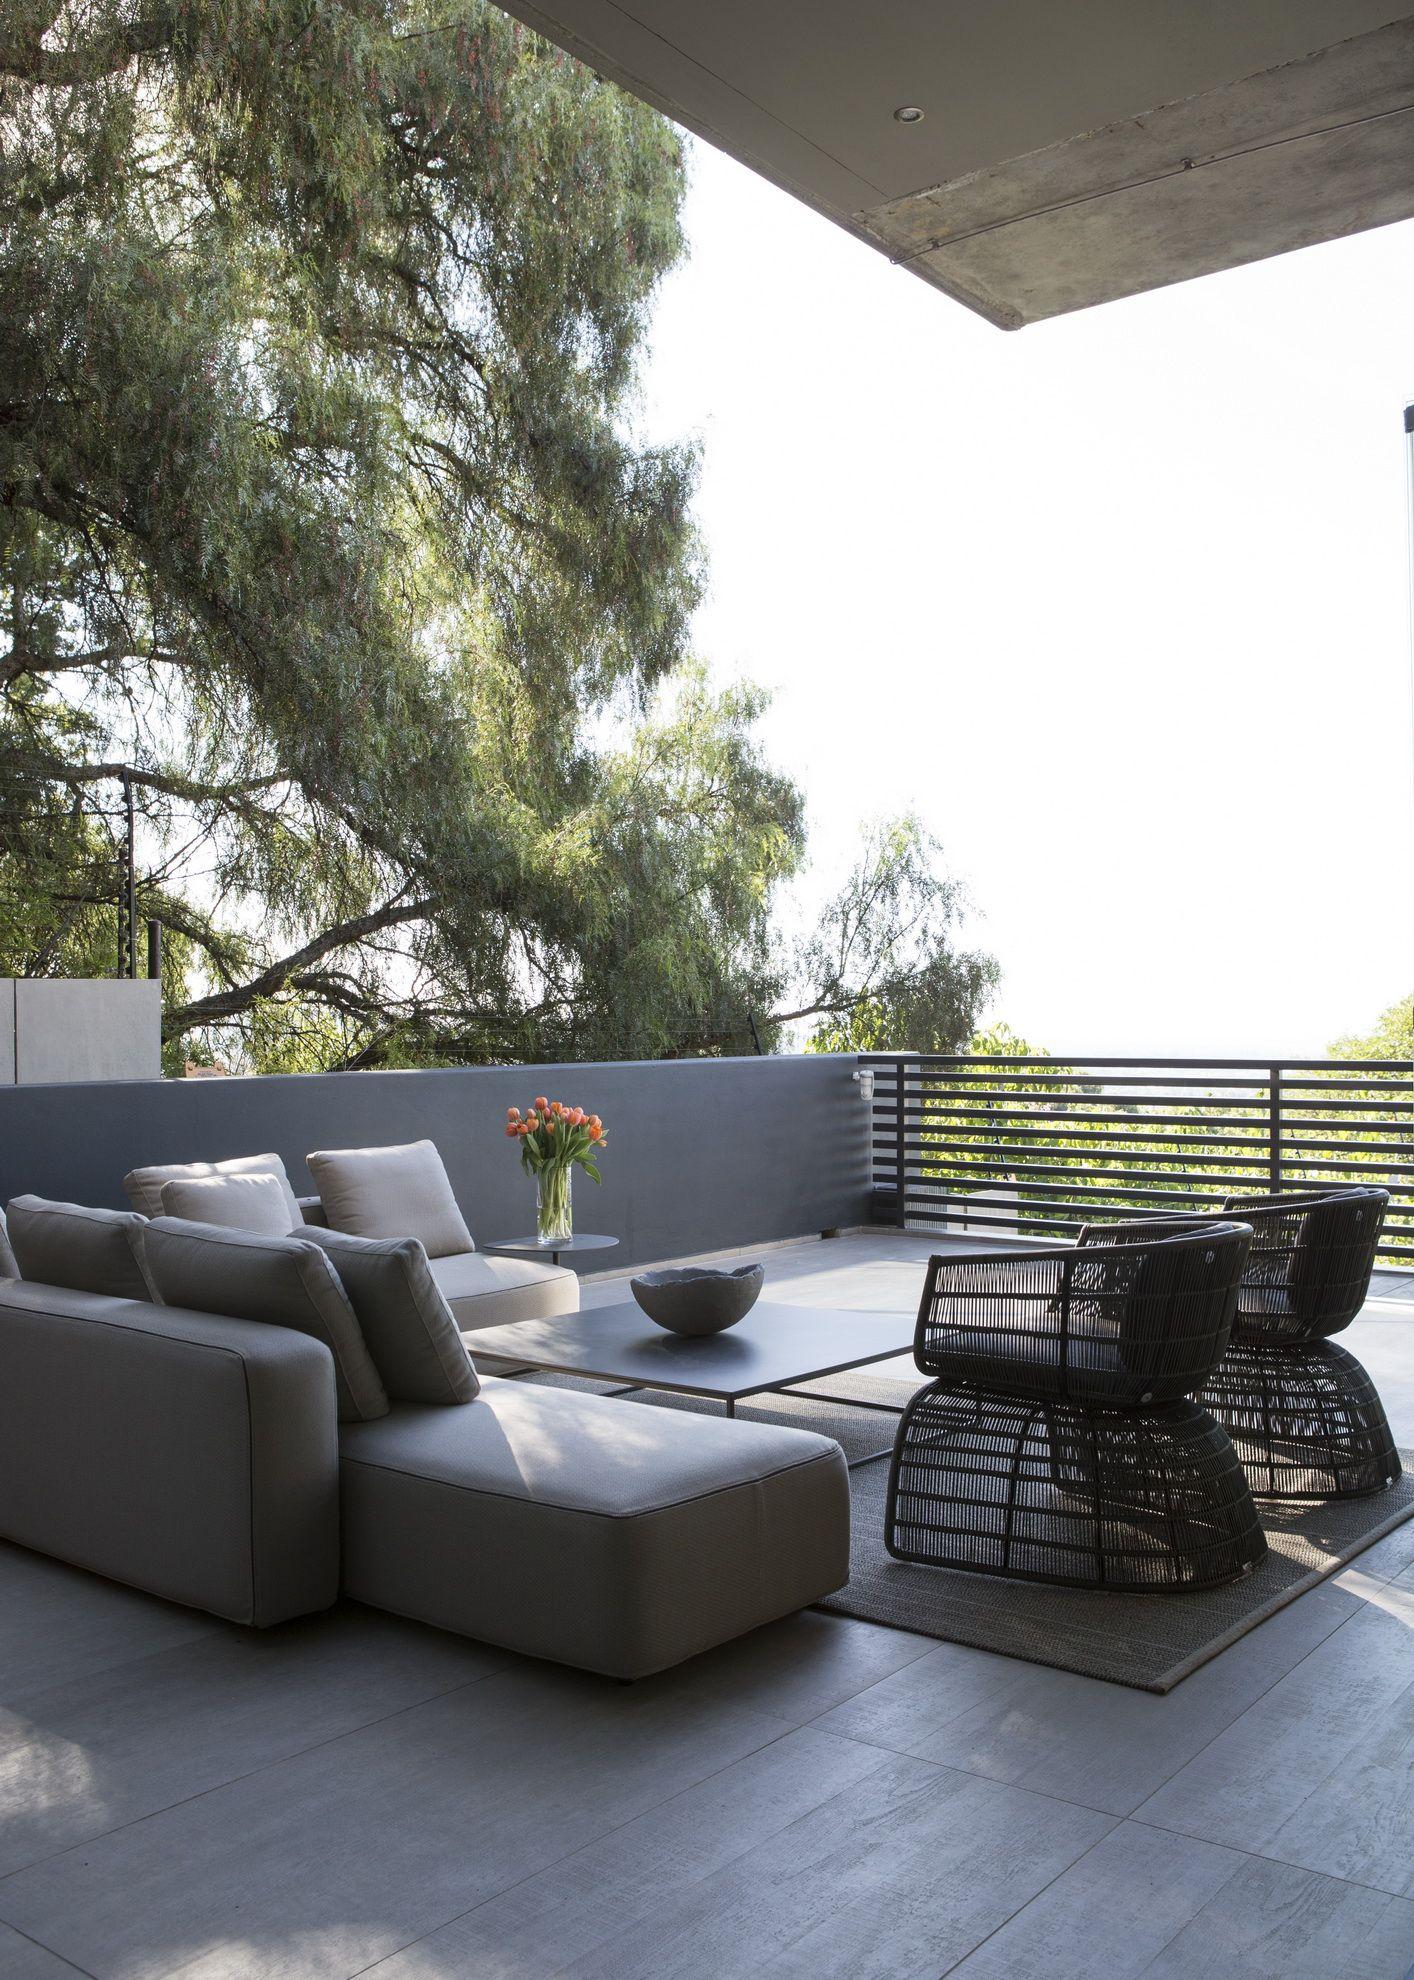 Concrete House   Outdoor Entertainment   Nico van der Meulen Architects #Design #Furniture #Outside #Contemporary